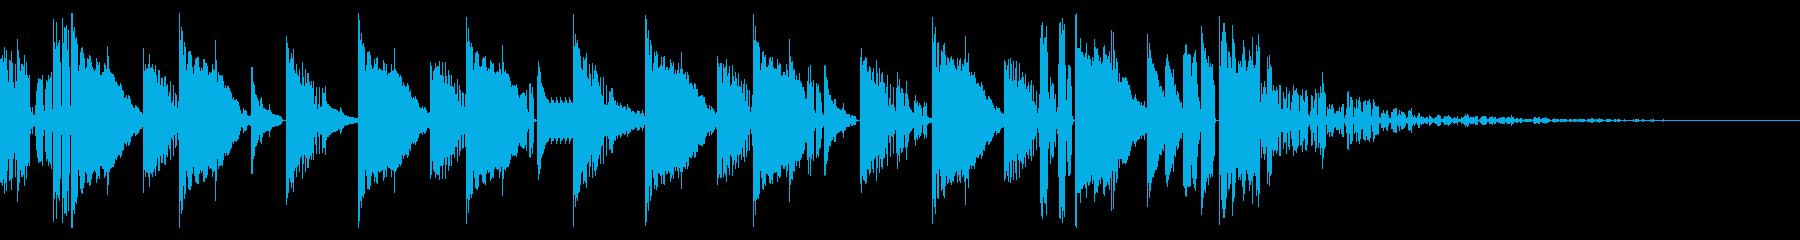 160 BPMの再生済みの波形